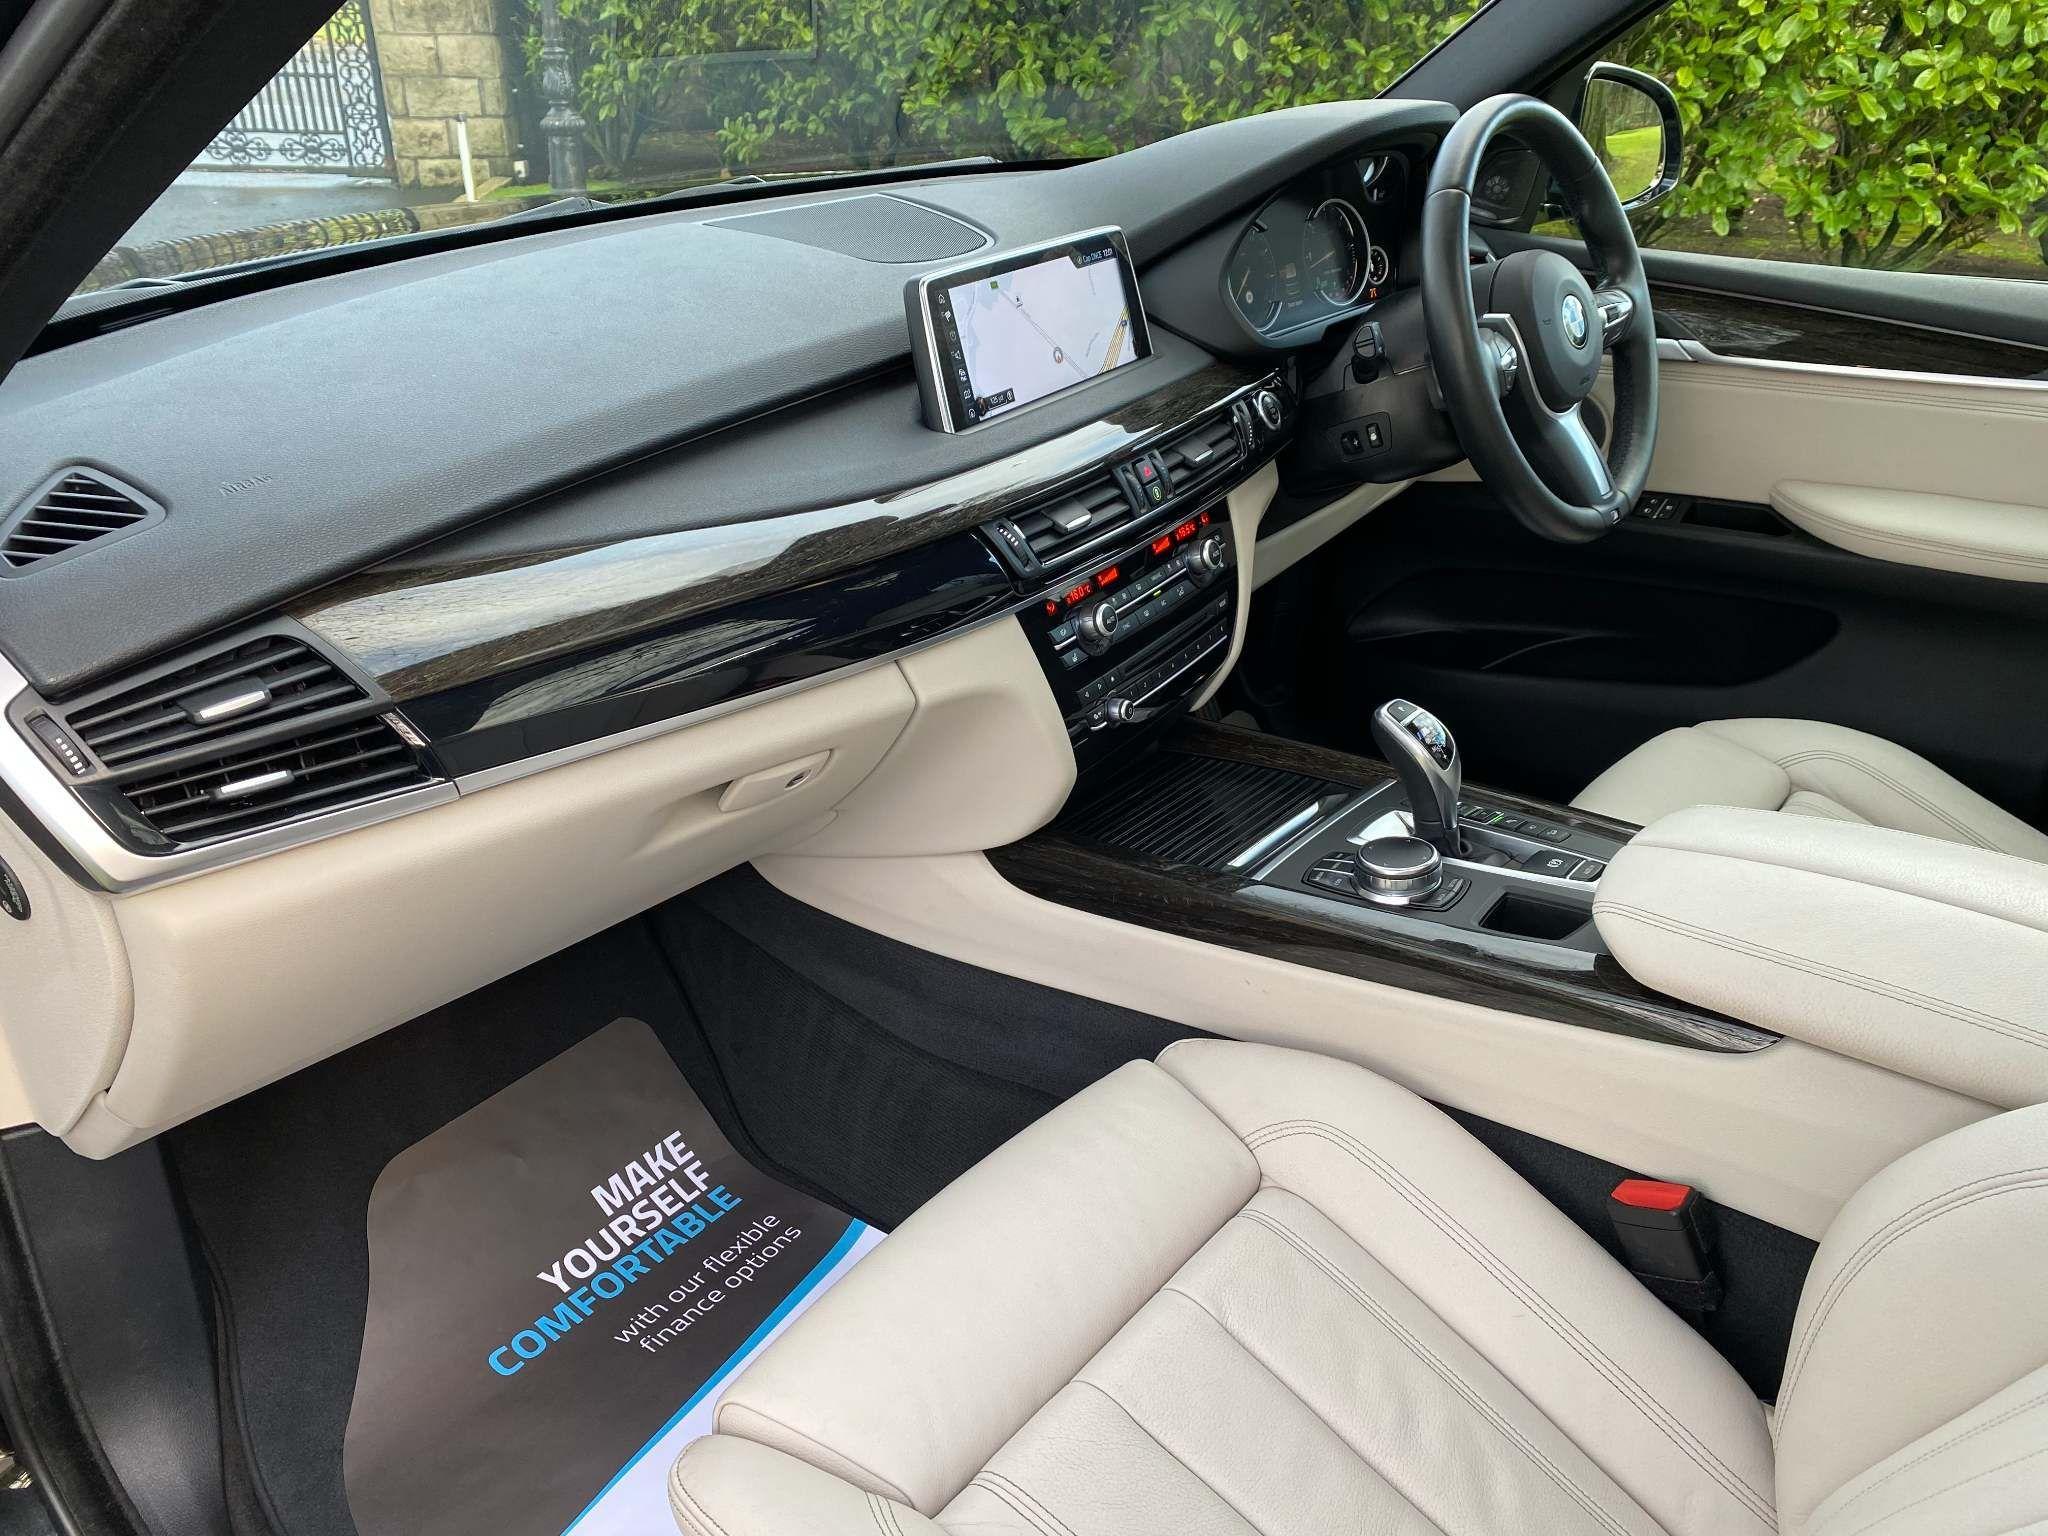 2017 BMW X5 3.0 M50d Auto xDrive (s/s) 5dr Diesel Automatic – Moyway Motors Dungannon full